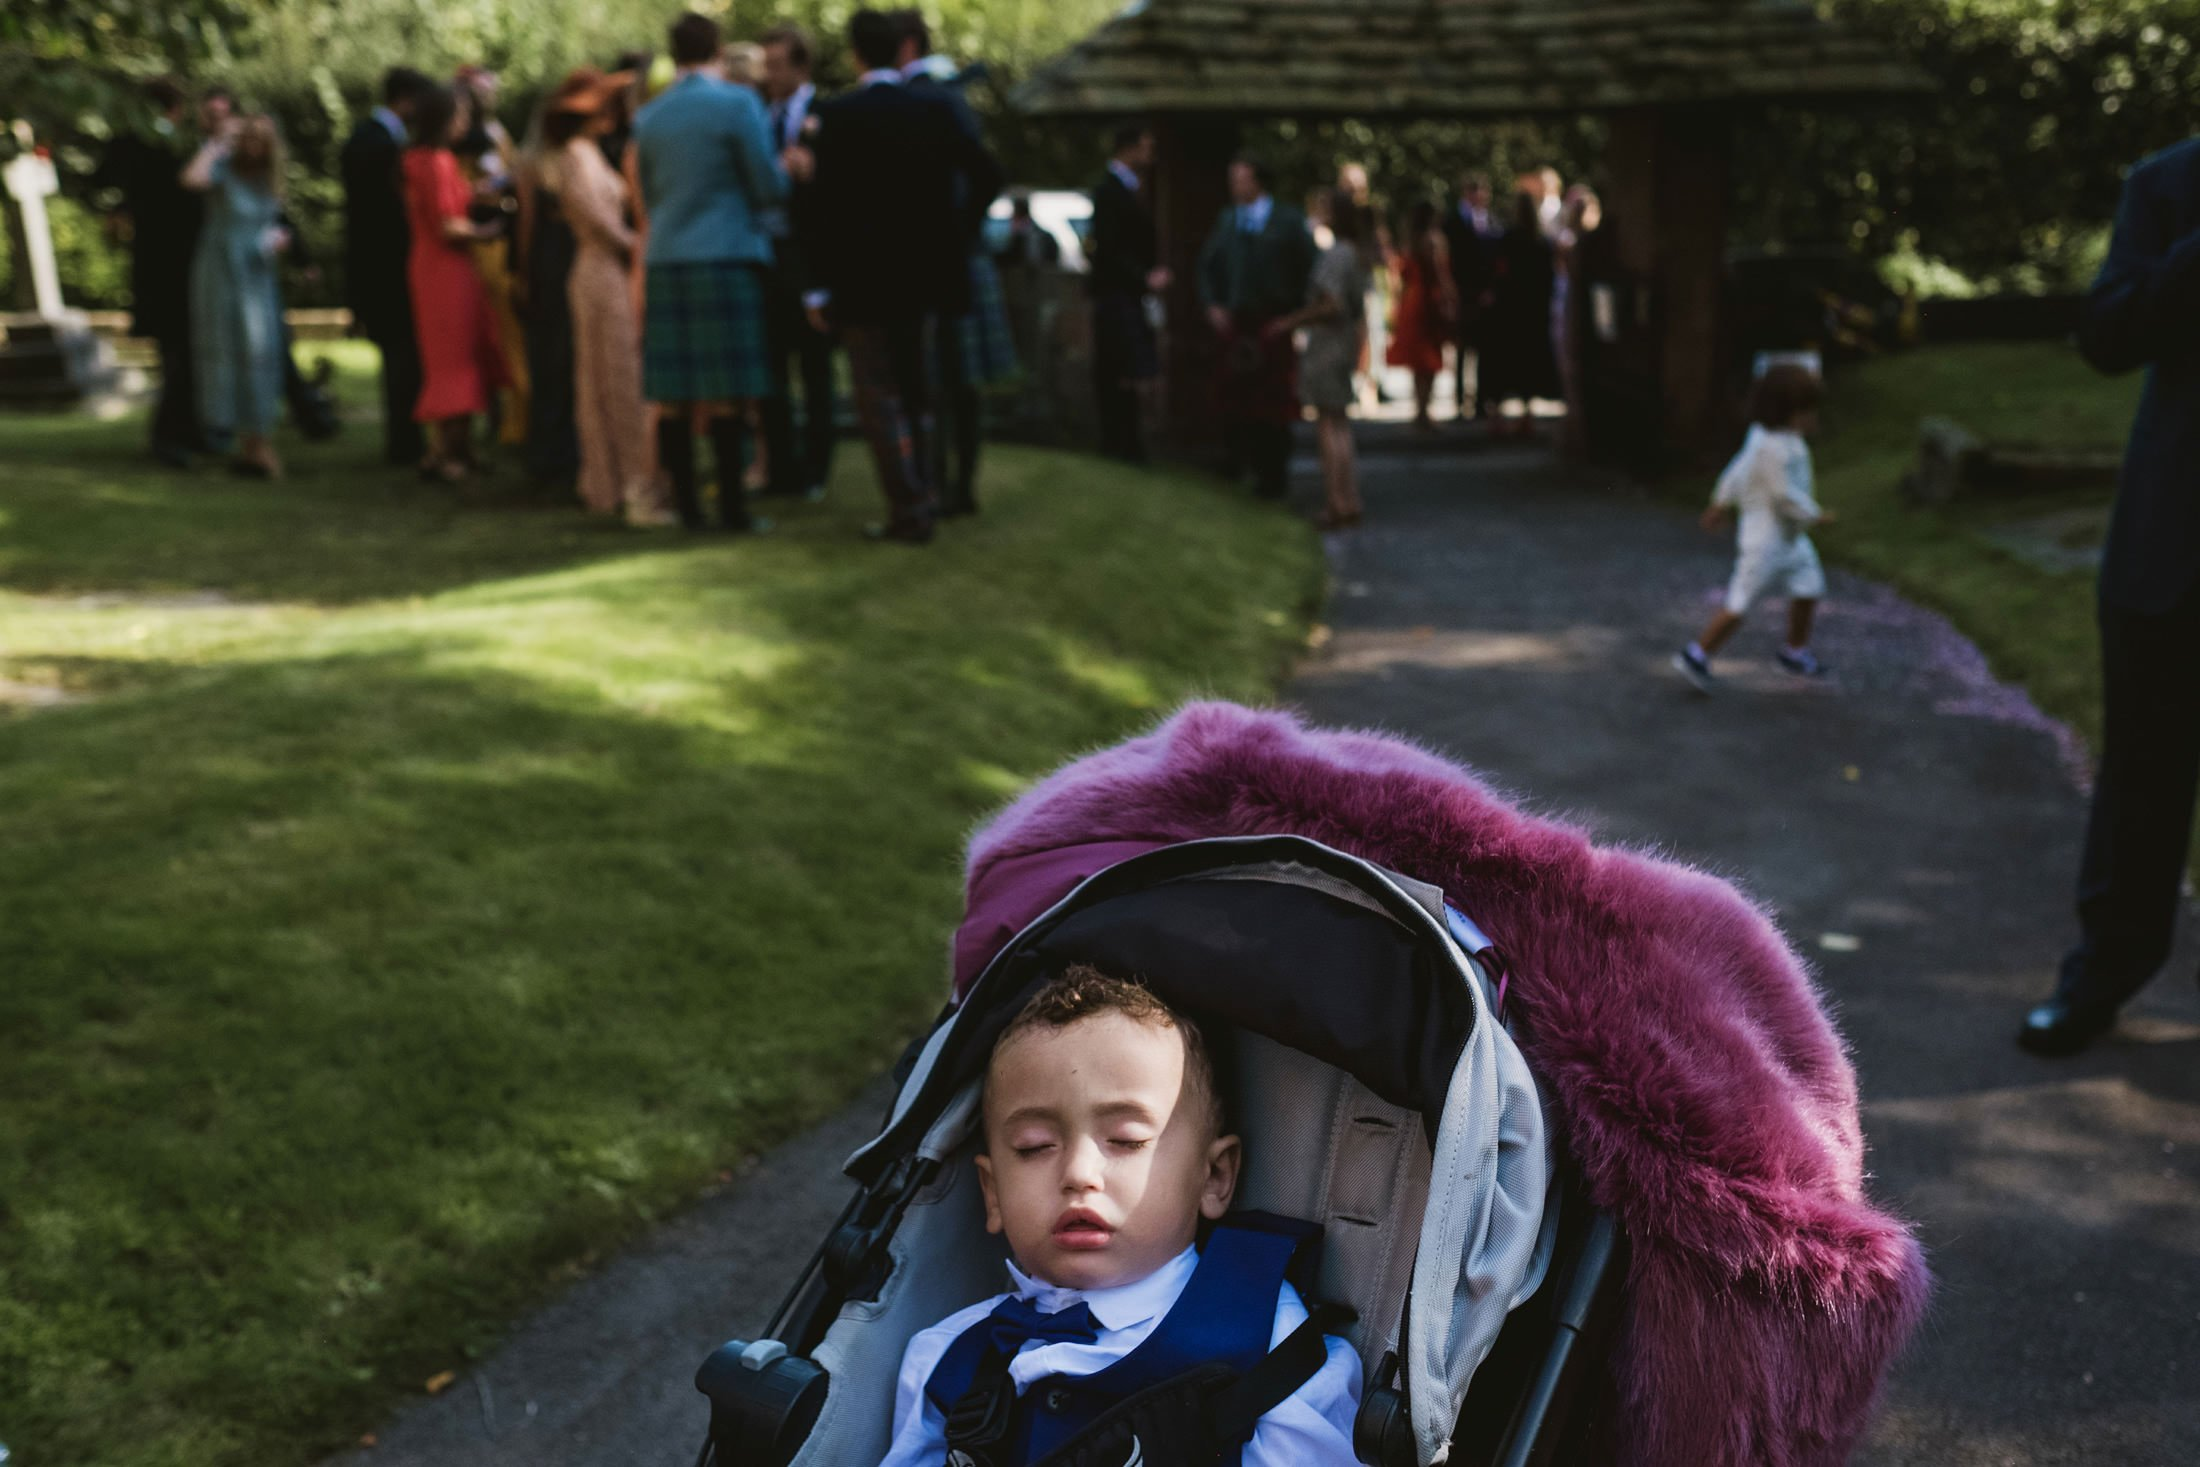 little boy sleeping in pram at church in Cheshire